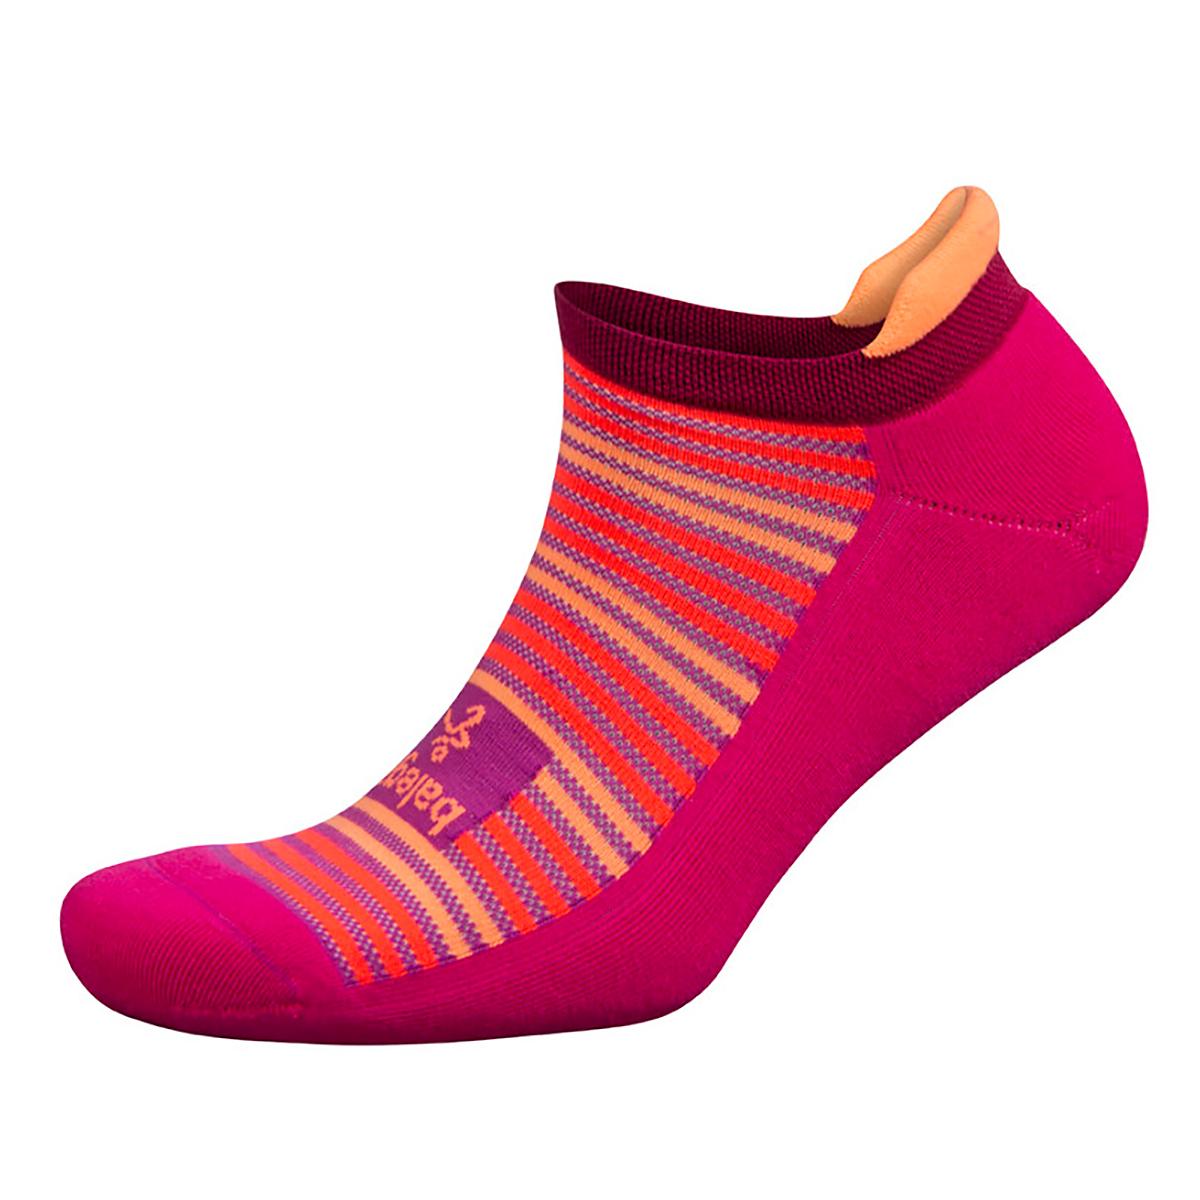 Balega Limited Edition Hidden Comfort - Color: Electric Pink Size: S, Red, large, image 1